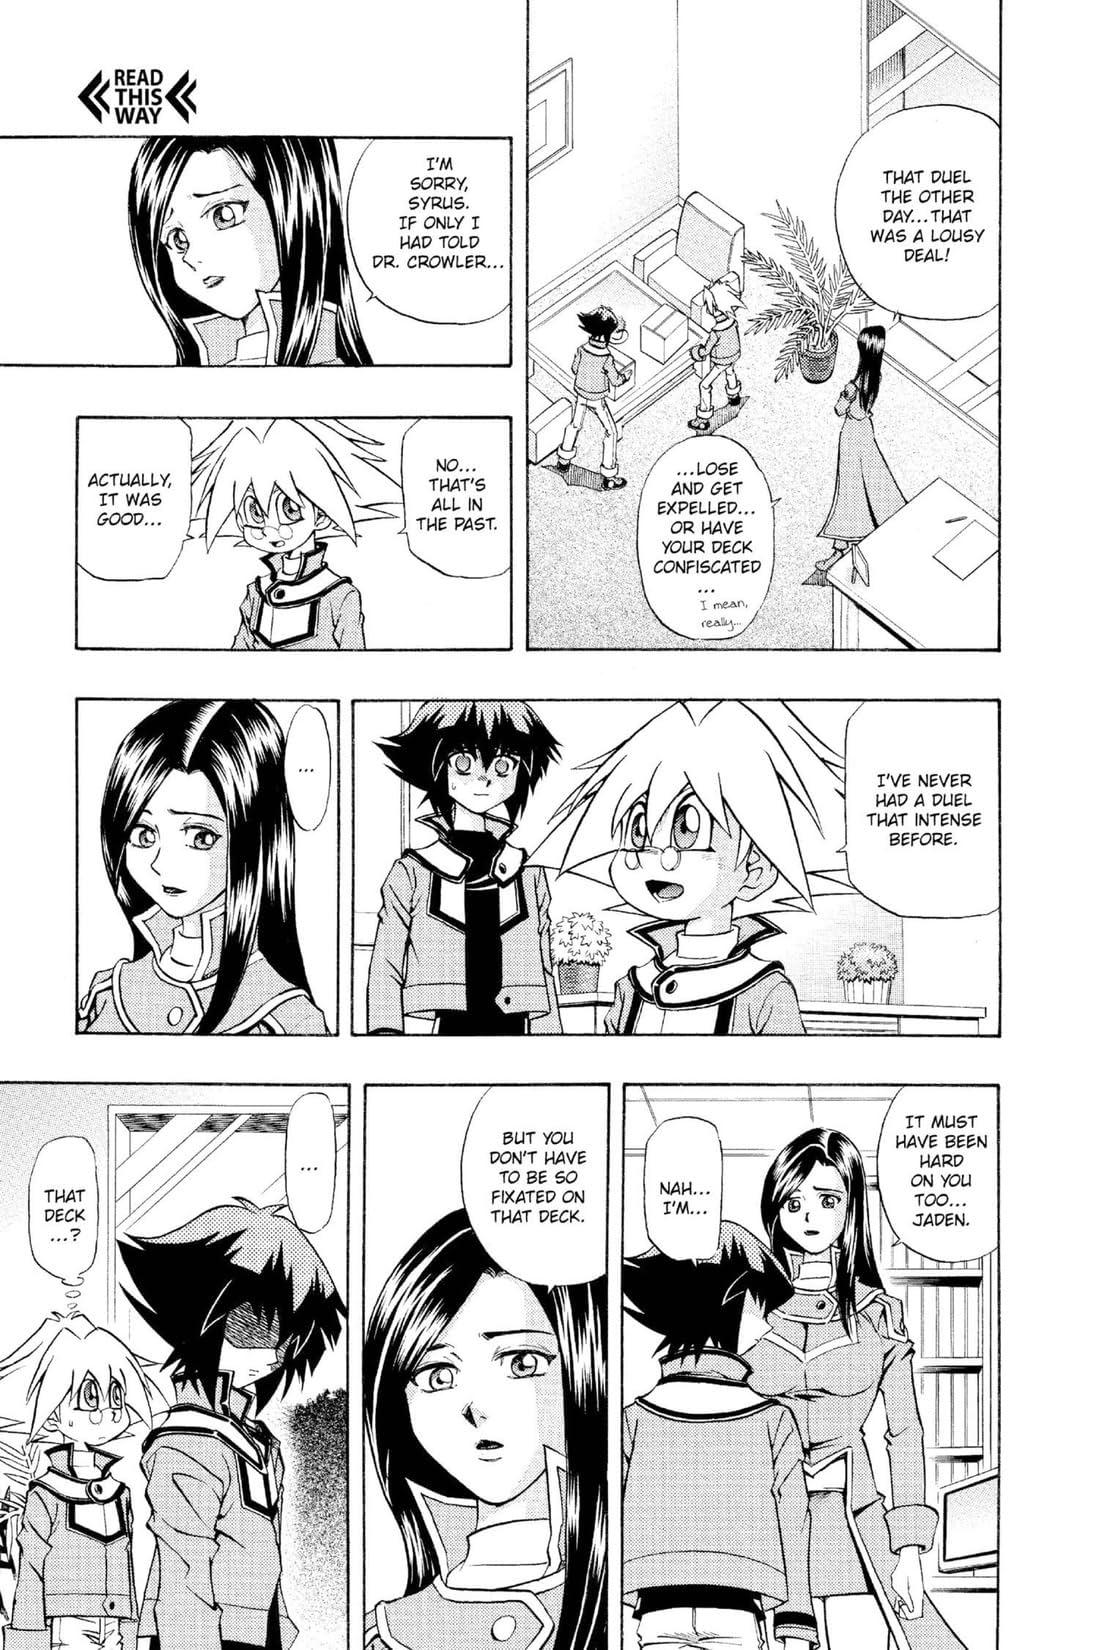 Yu-Gi-Oh! GX Vol. 2